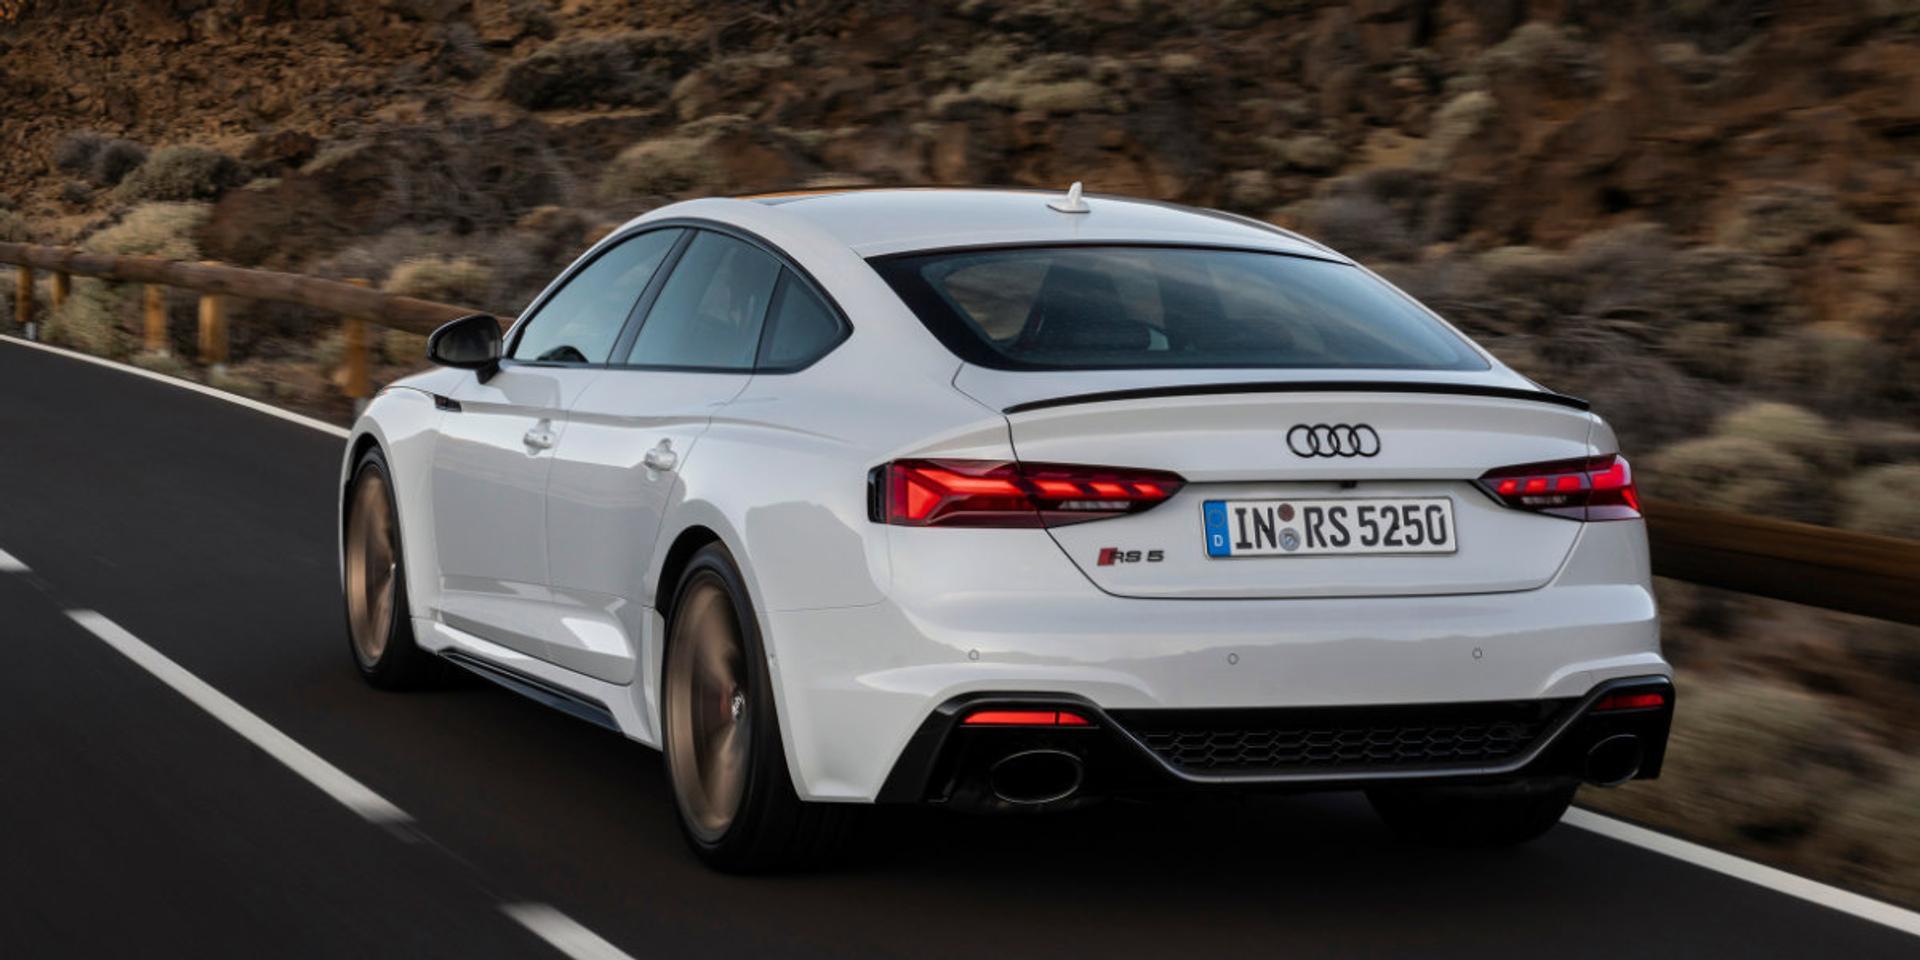 Audi RS5 rear view